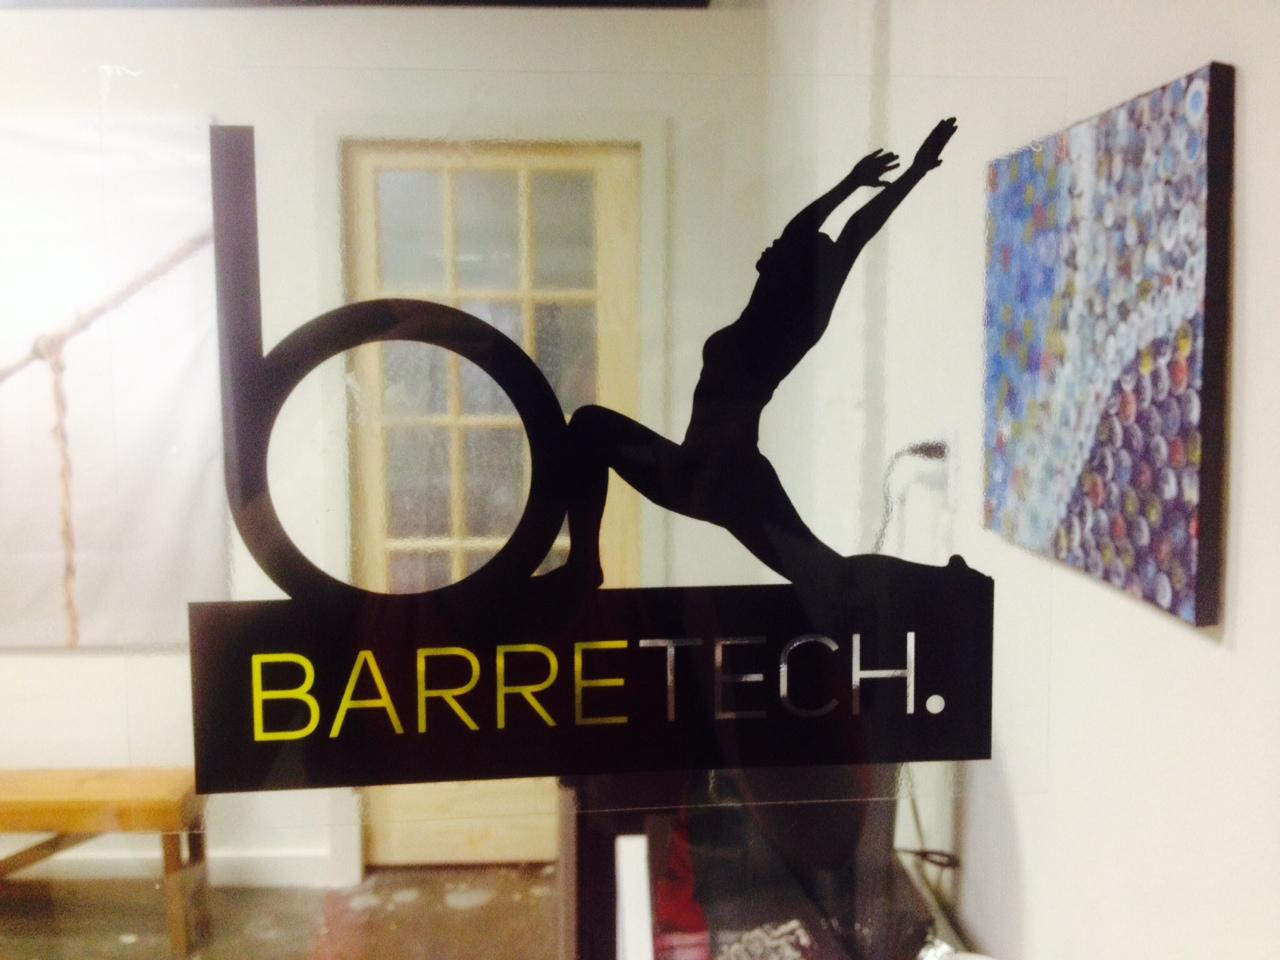 BarreTech1